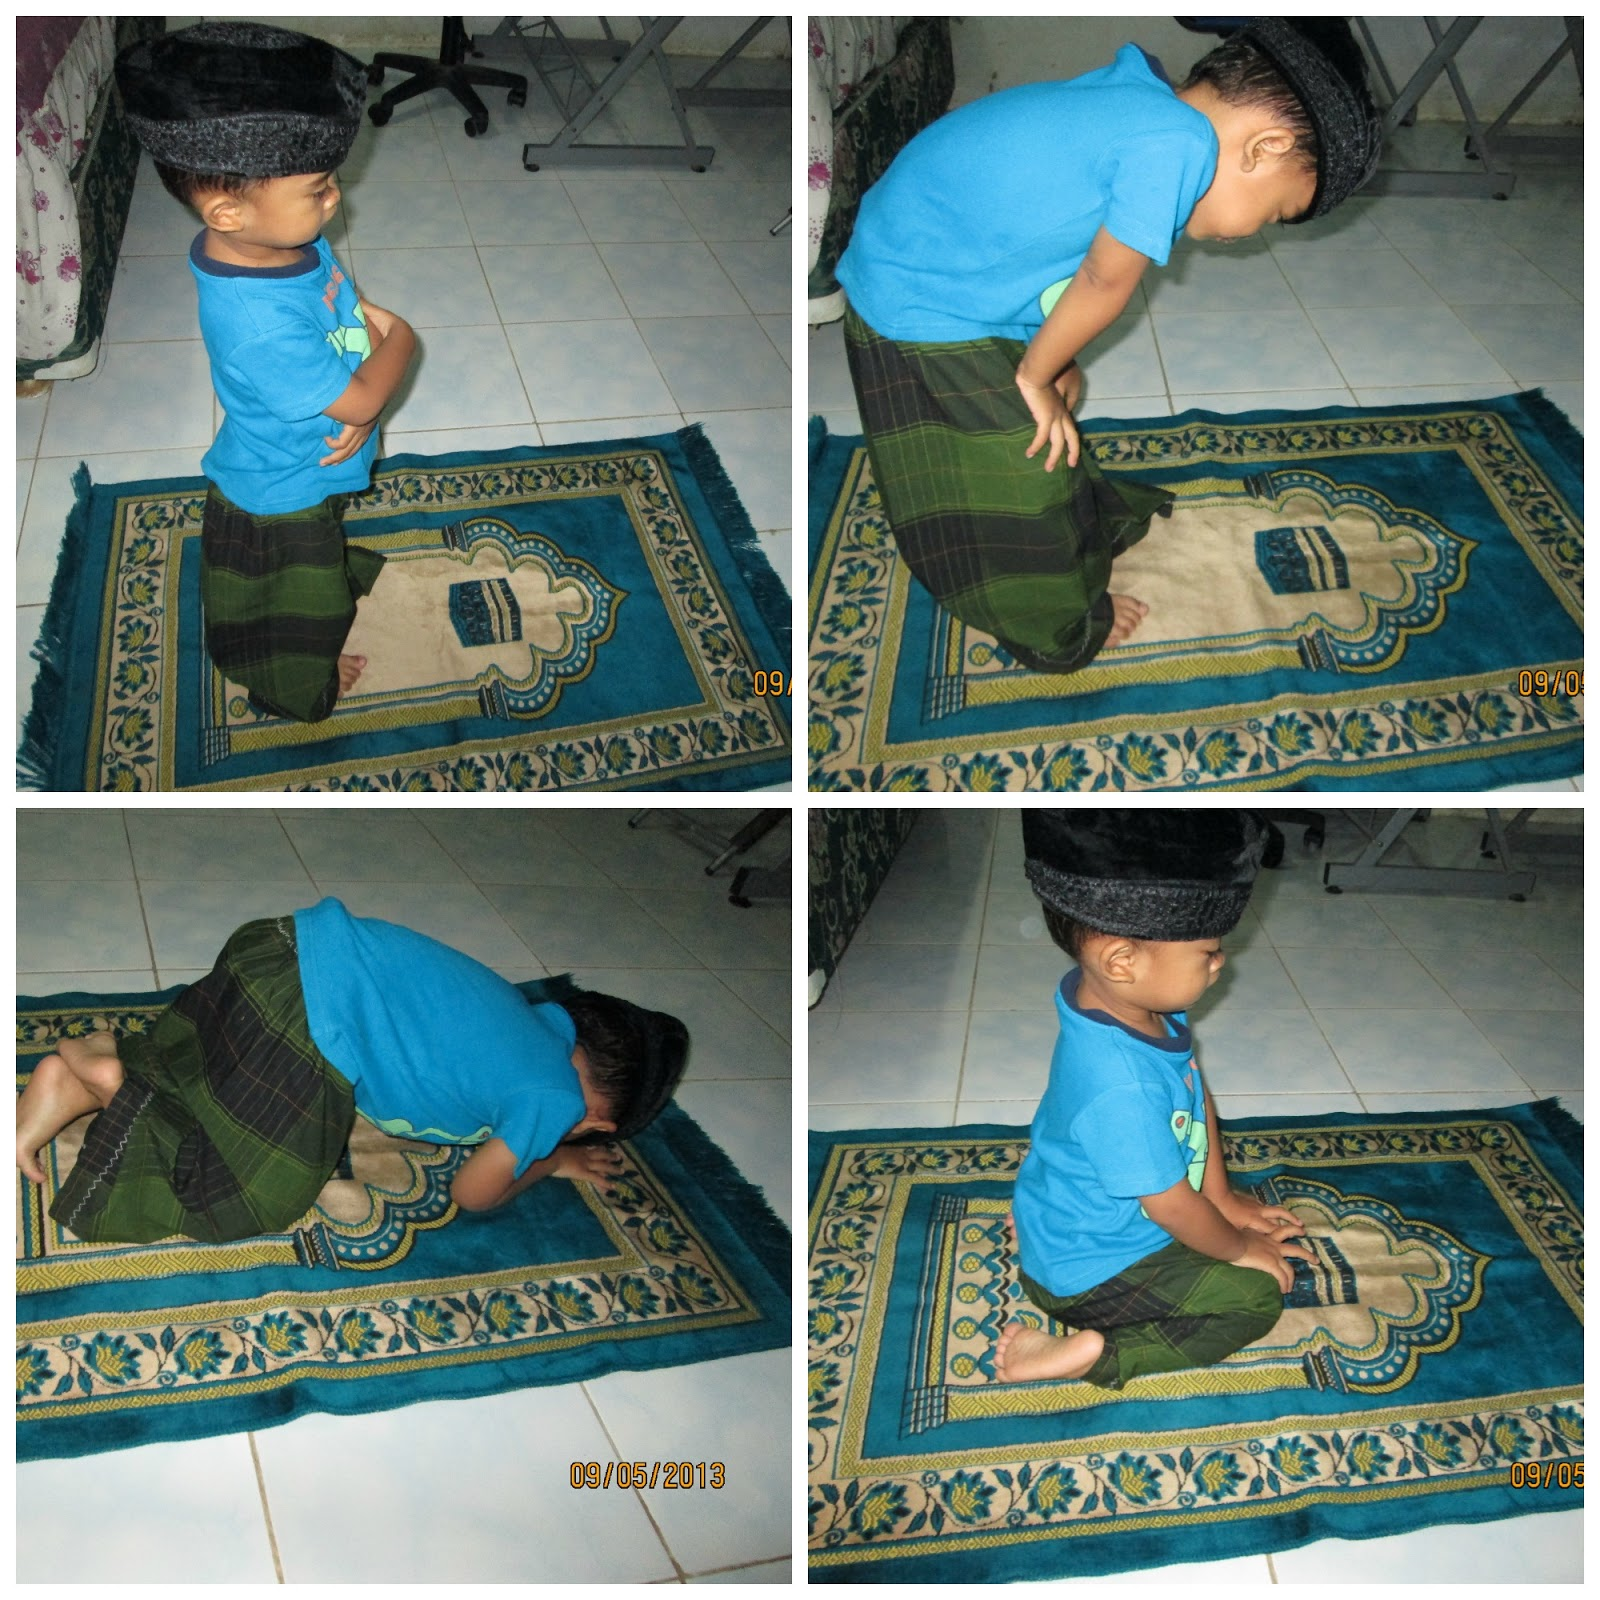 Jendela Lia Membuka Dunia Baru Sholat Ke Masjid